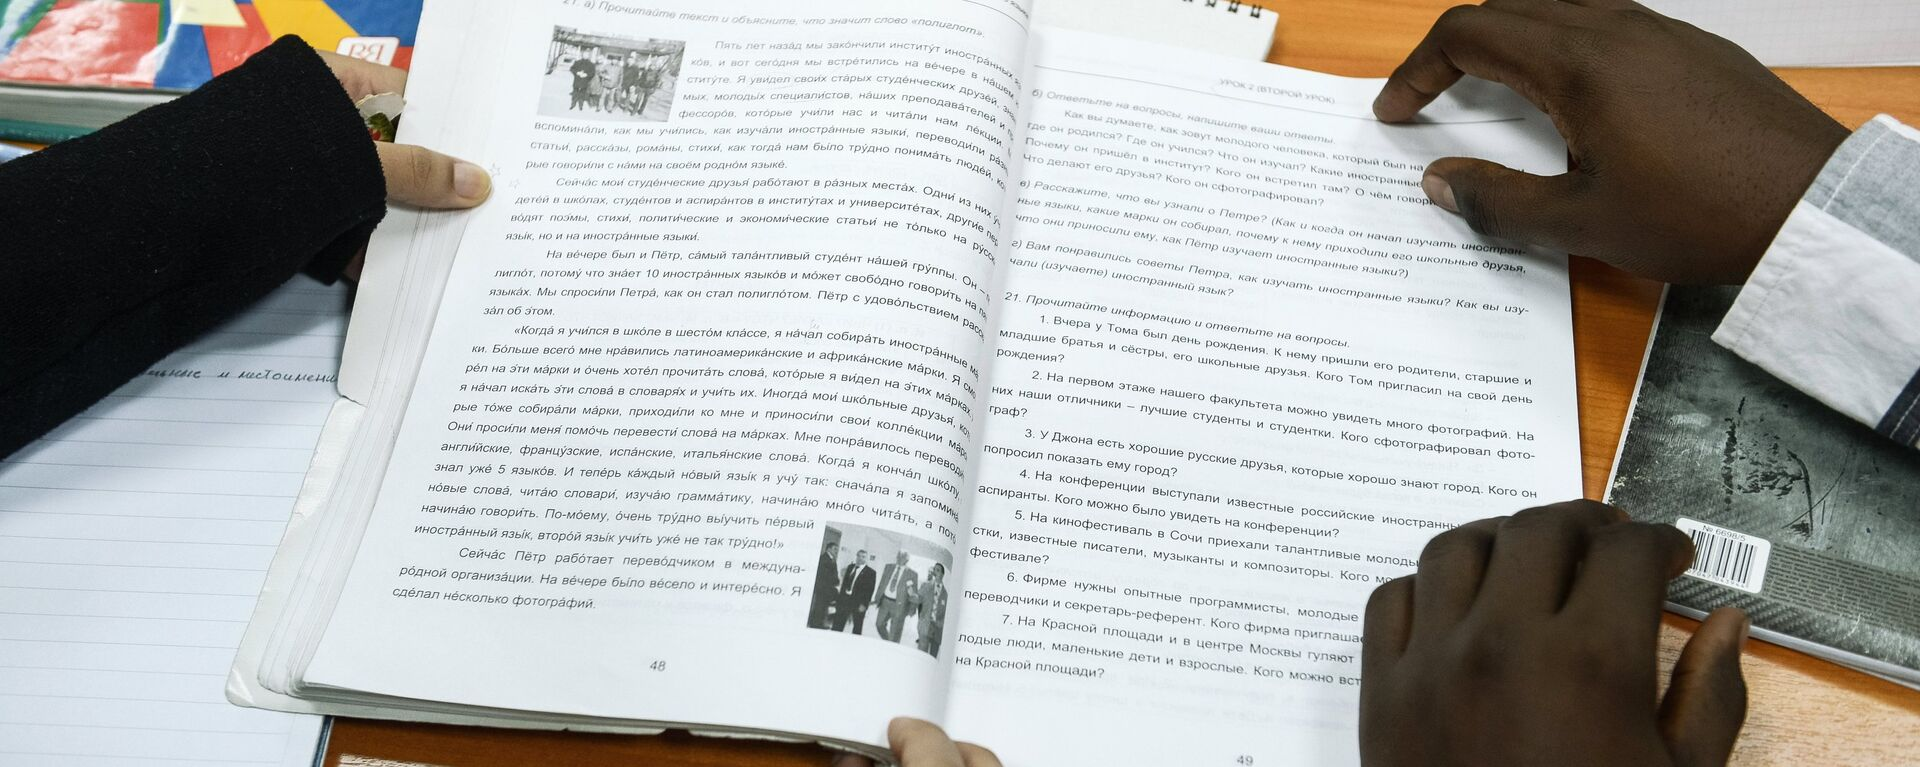 Idioma ruso - Sputnik Mundo, 1920, 08.06.2021